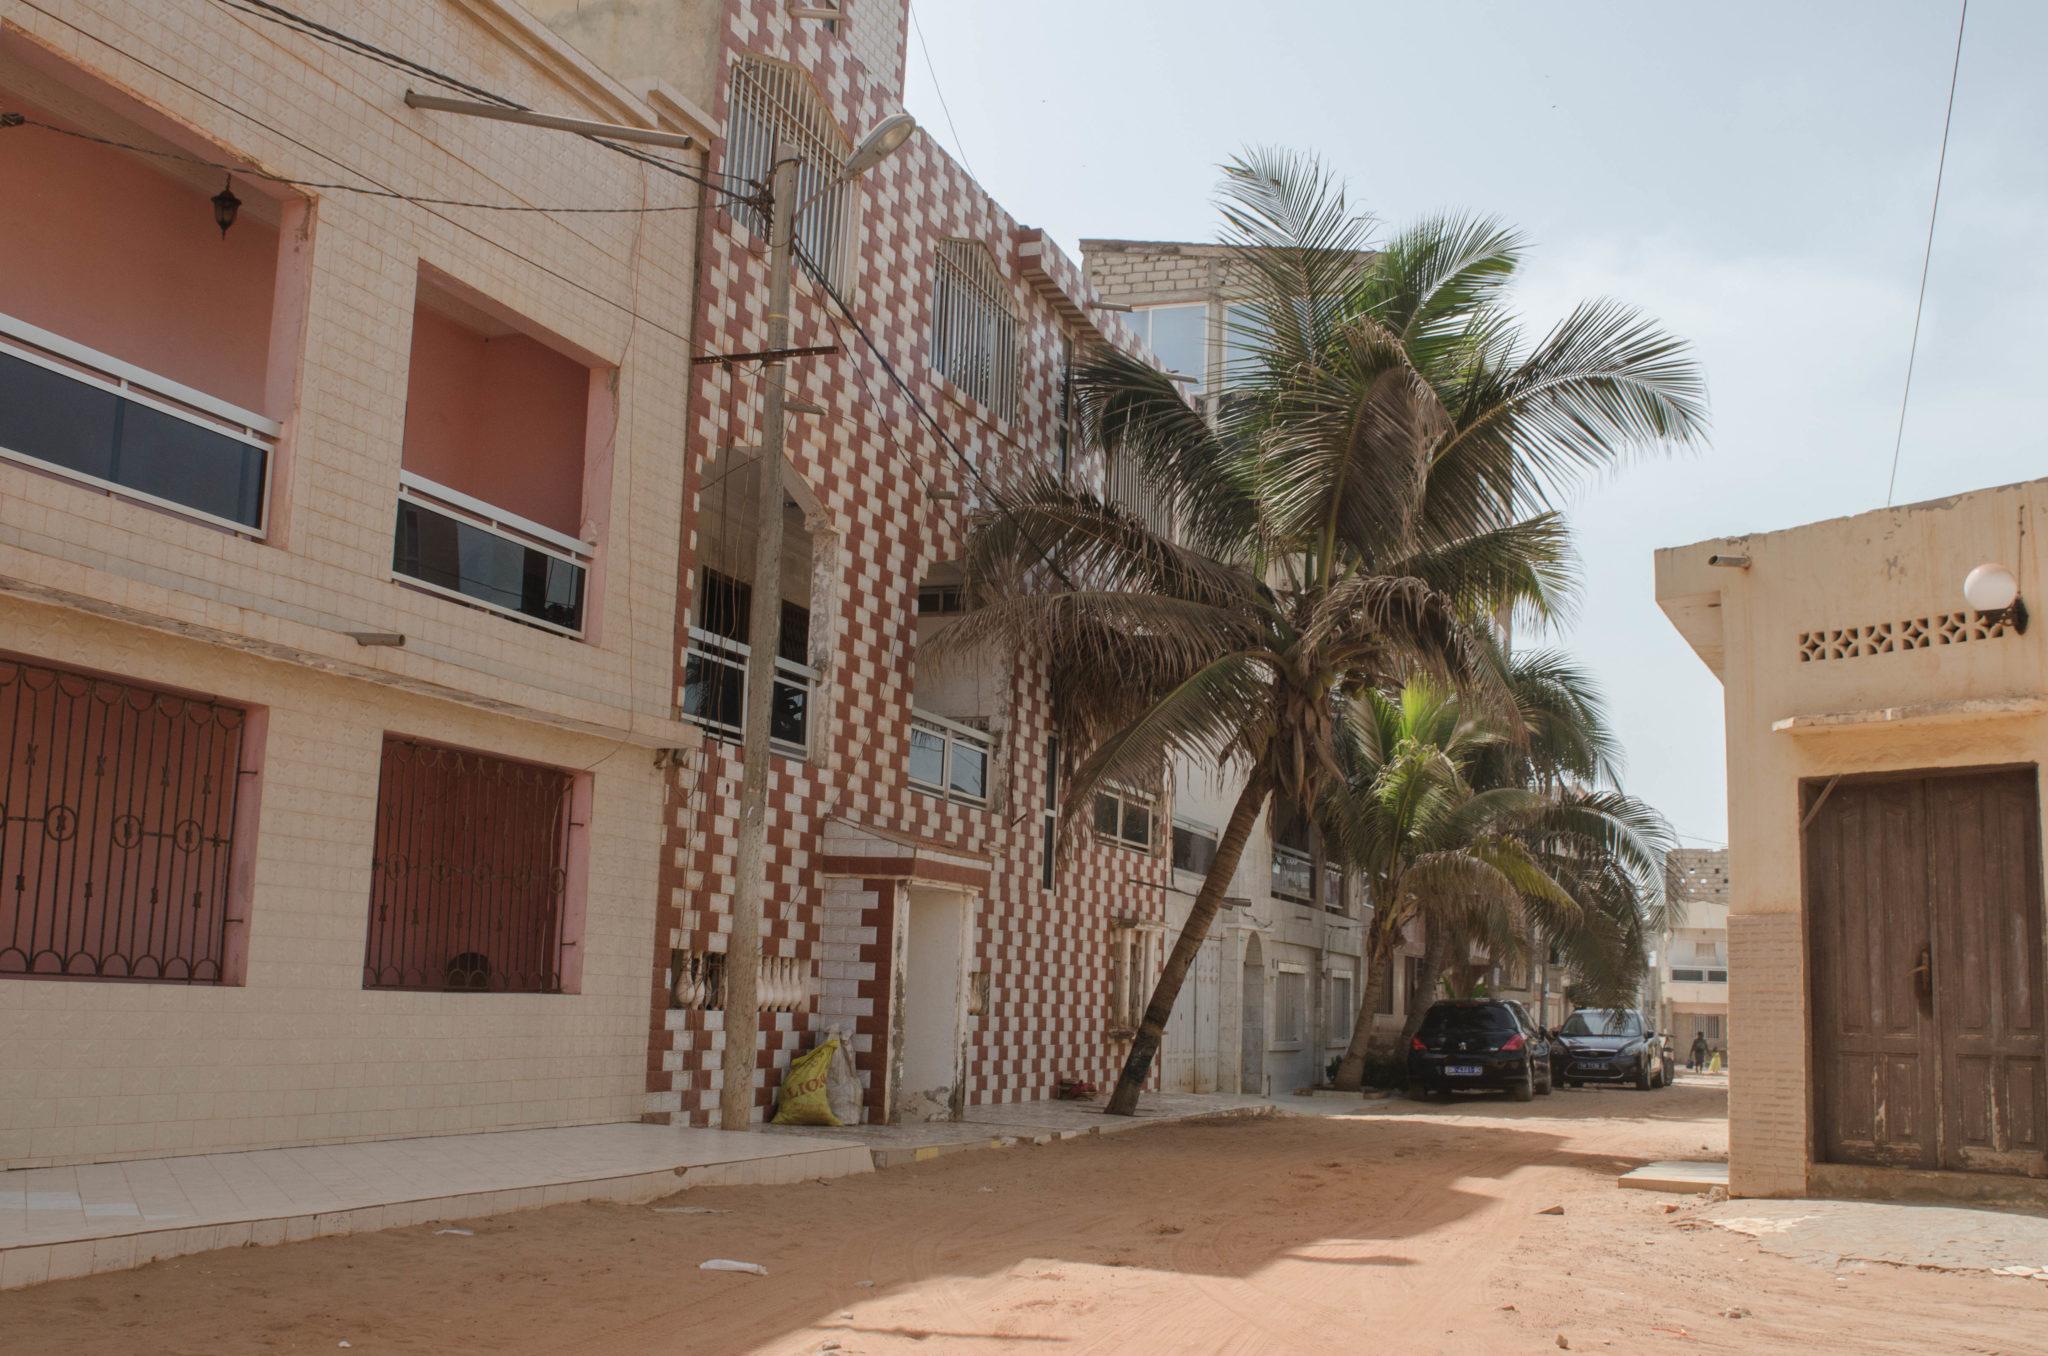 Senegal-Sehenswuerdigkeiten-Yoff-Dakar